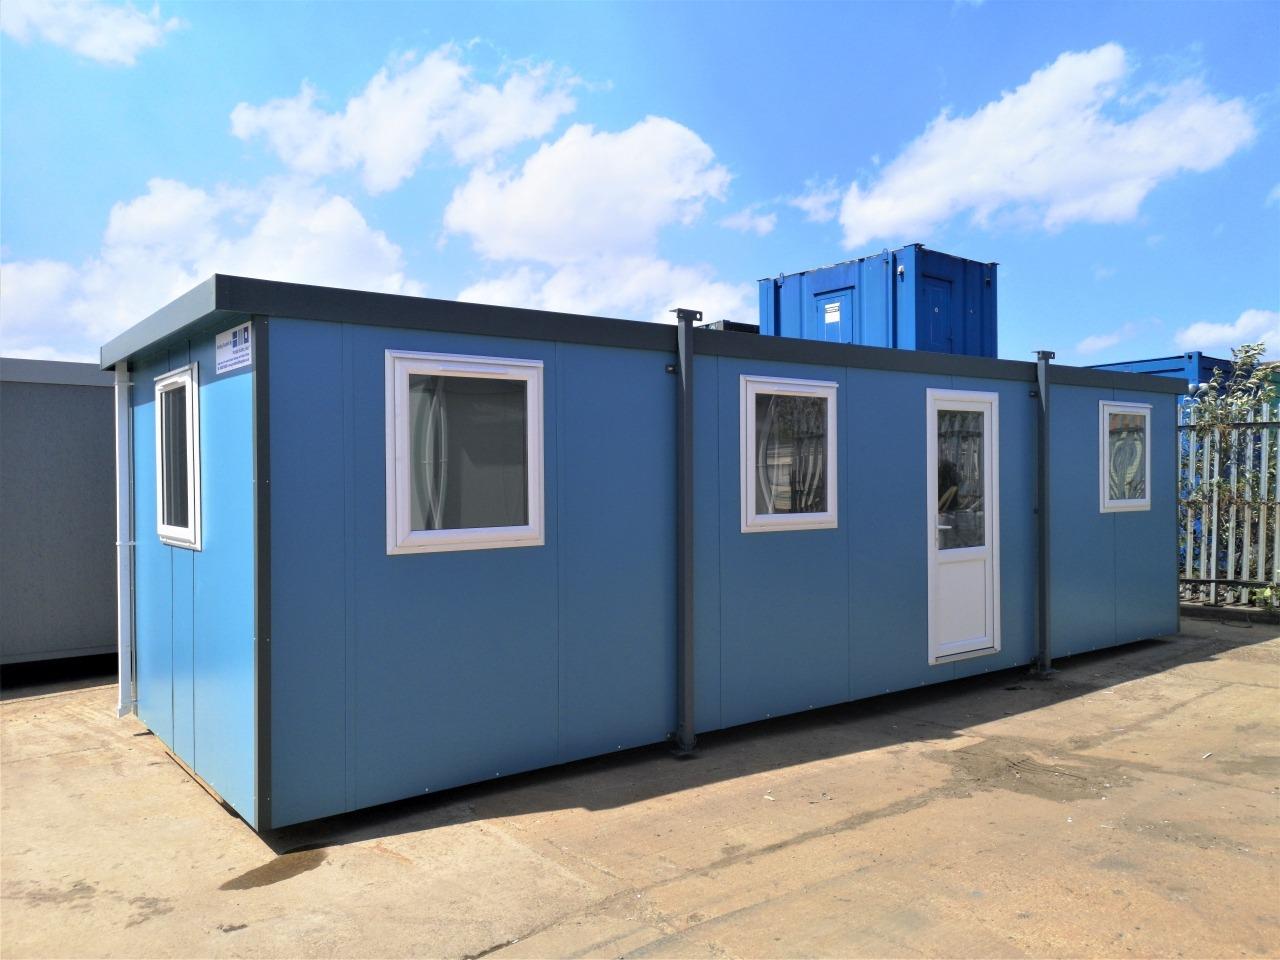 30′ x 10′ Portable Building Image